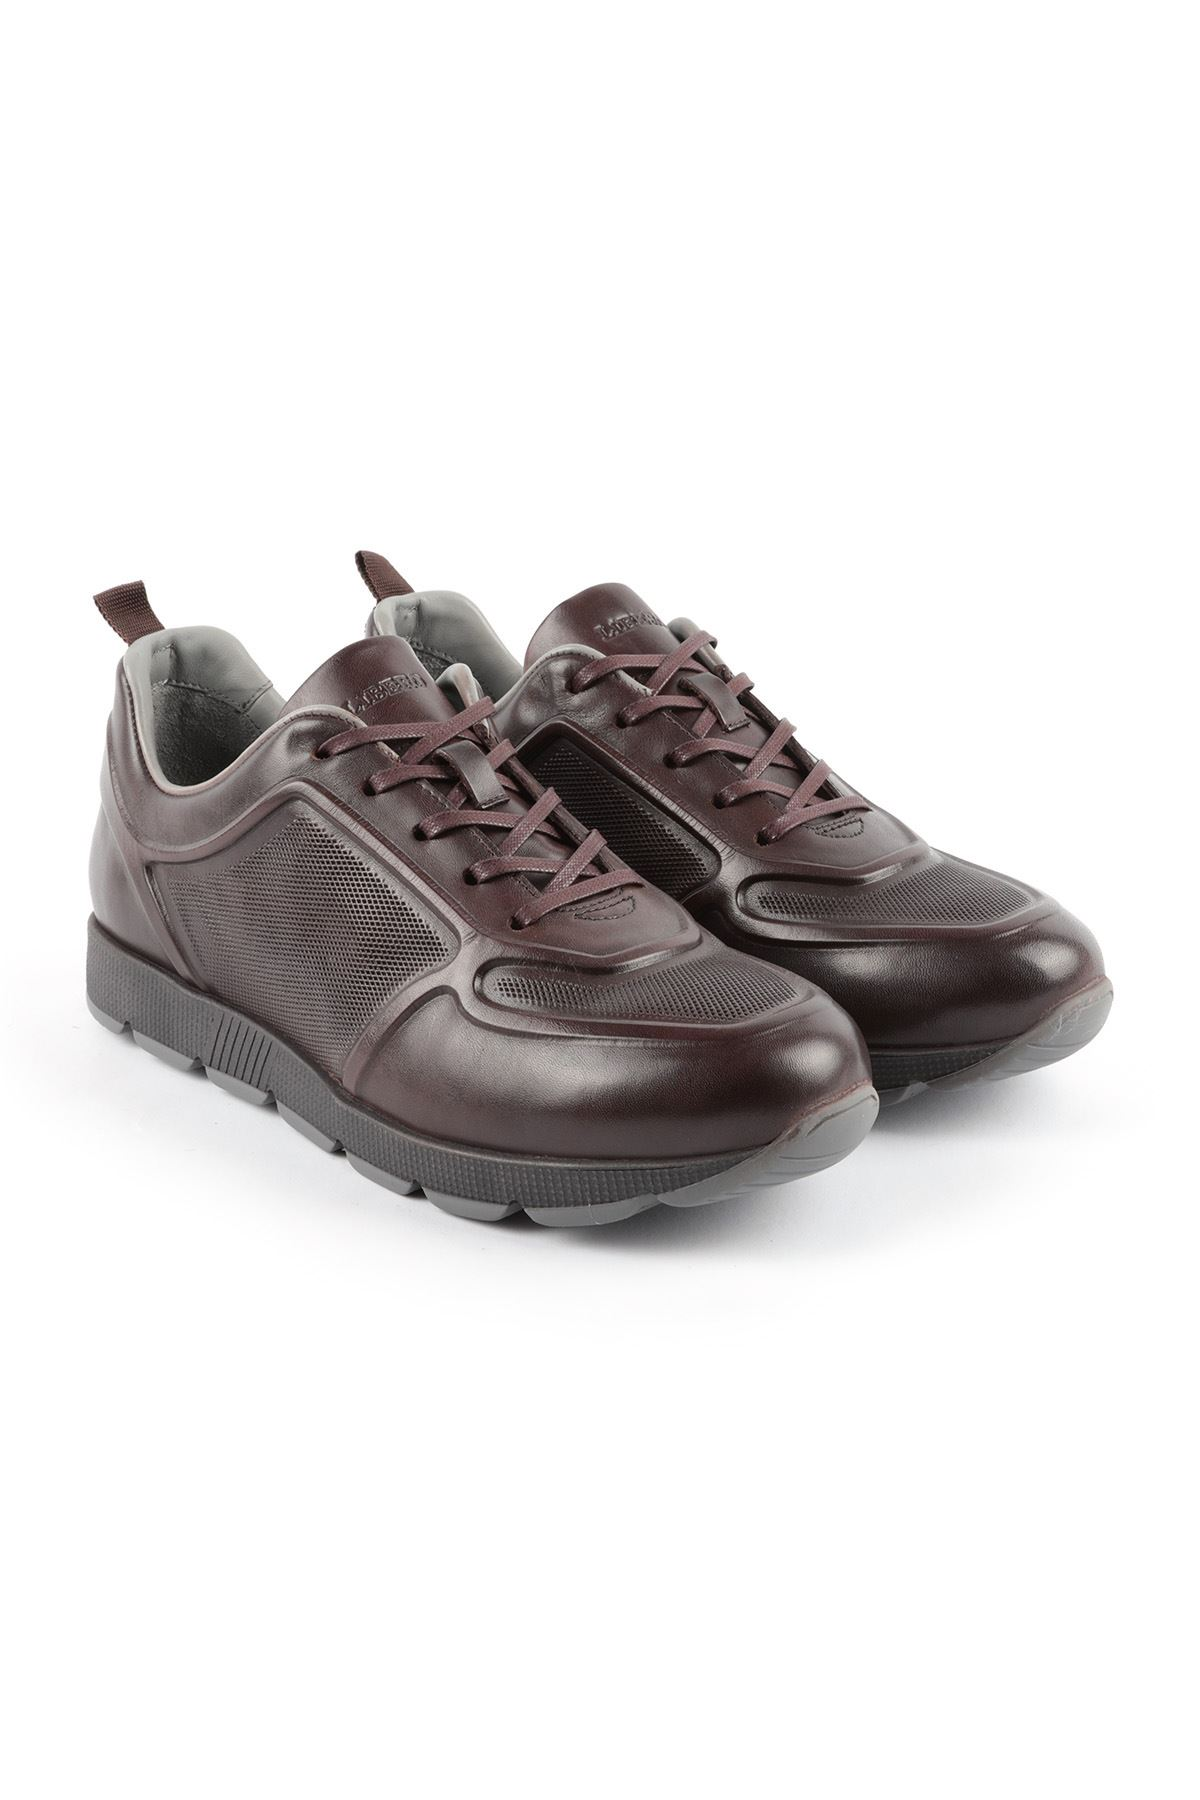 Libero L3497 EA Kahverengi Erkek Ayakkabı